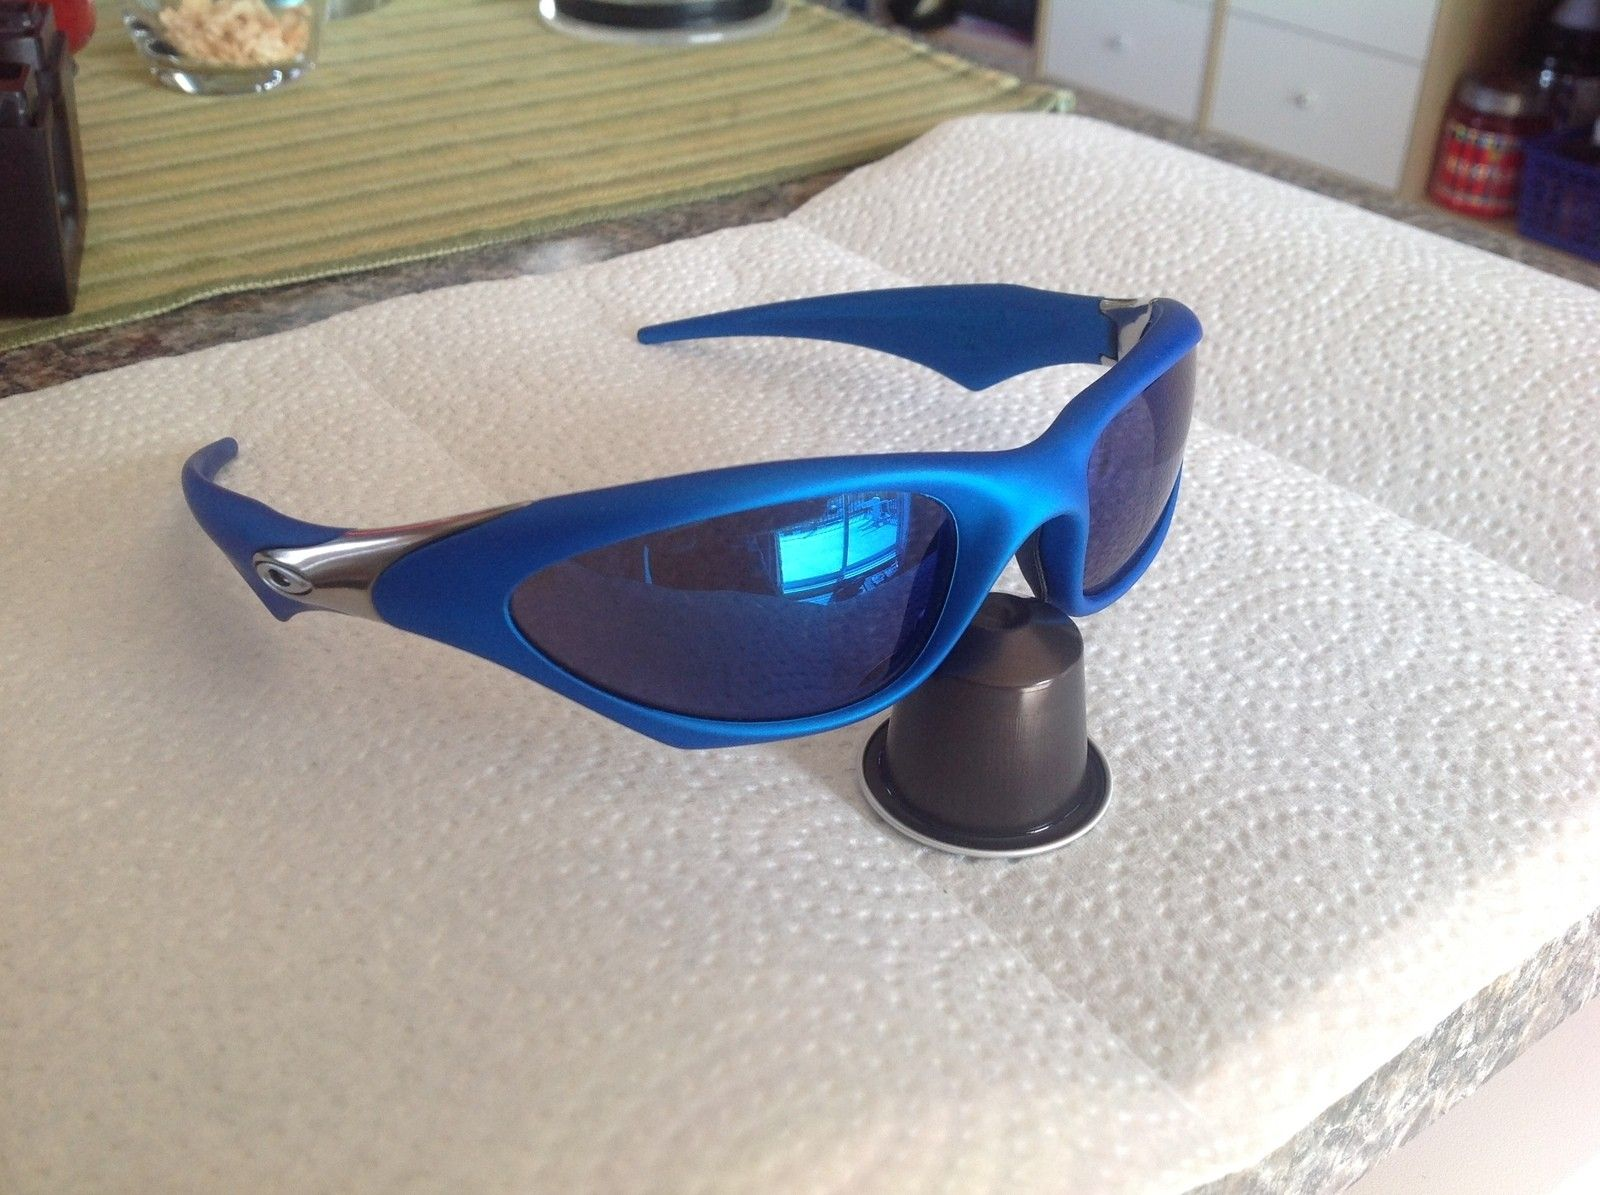 Blue Scar And Case - 2014-04-17 13.45.09.jpg